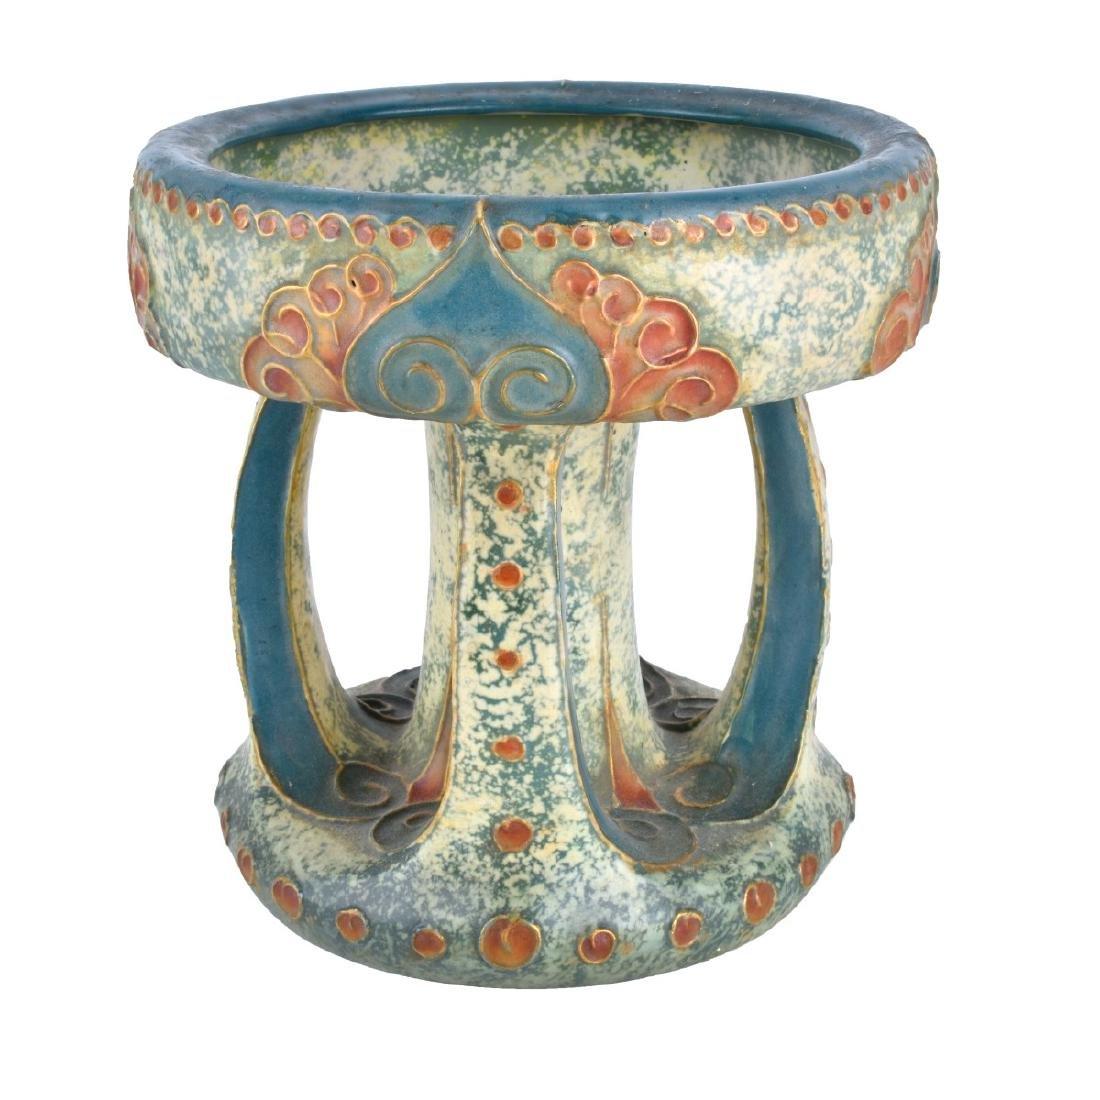 Amphora Turn Teplitz Gres Pottery Compote